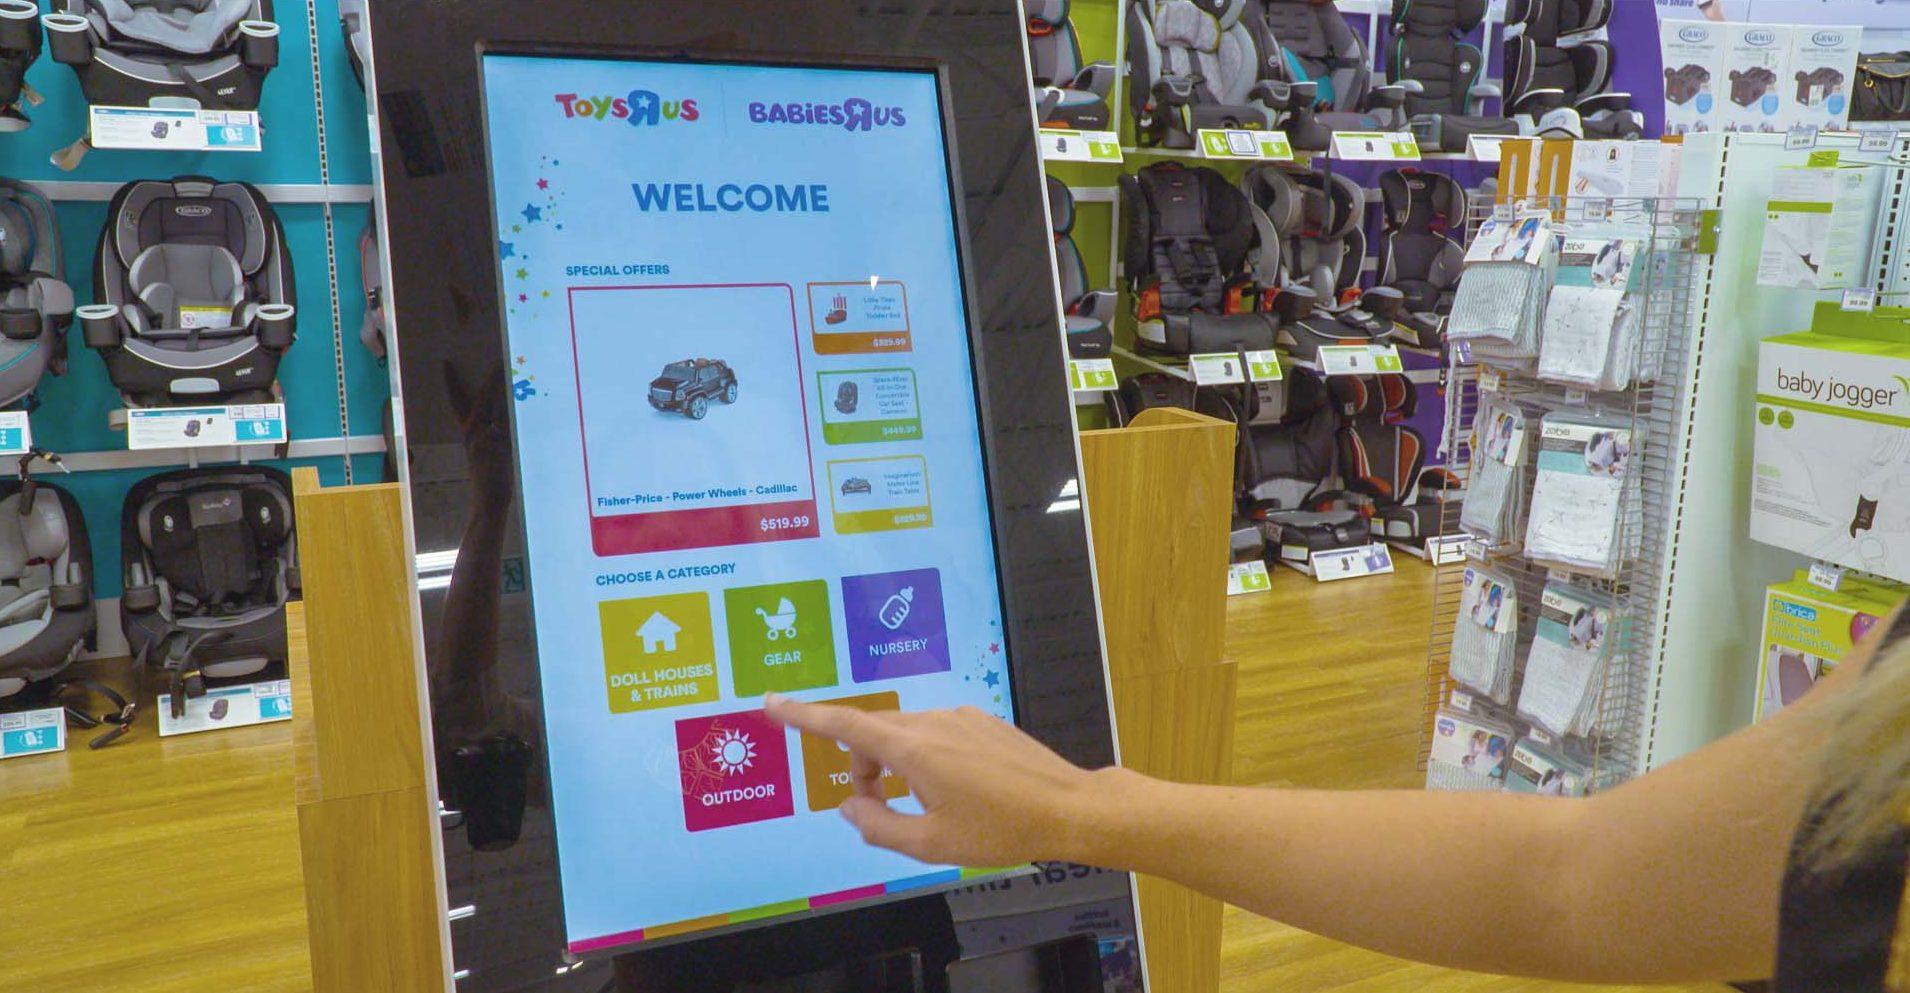 Toys R Us kiosks in Langley, B.C., win 2018 Digi Award - Sign Media